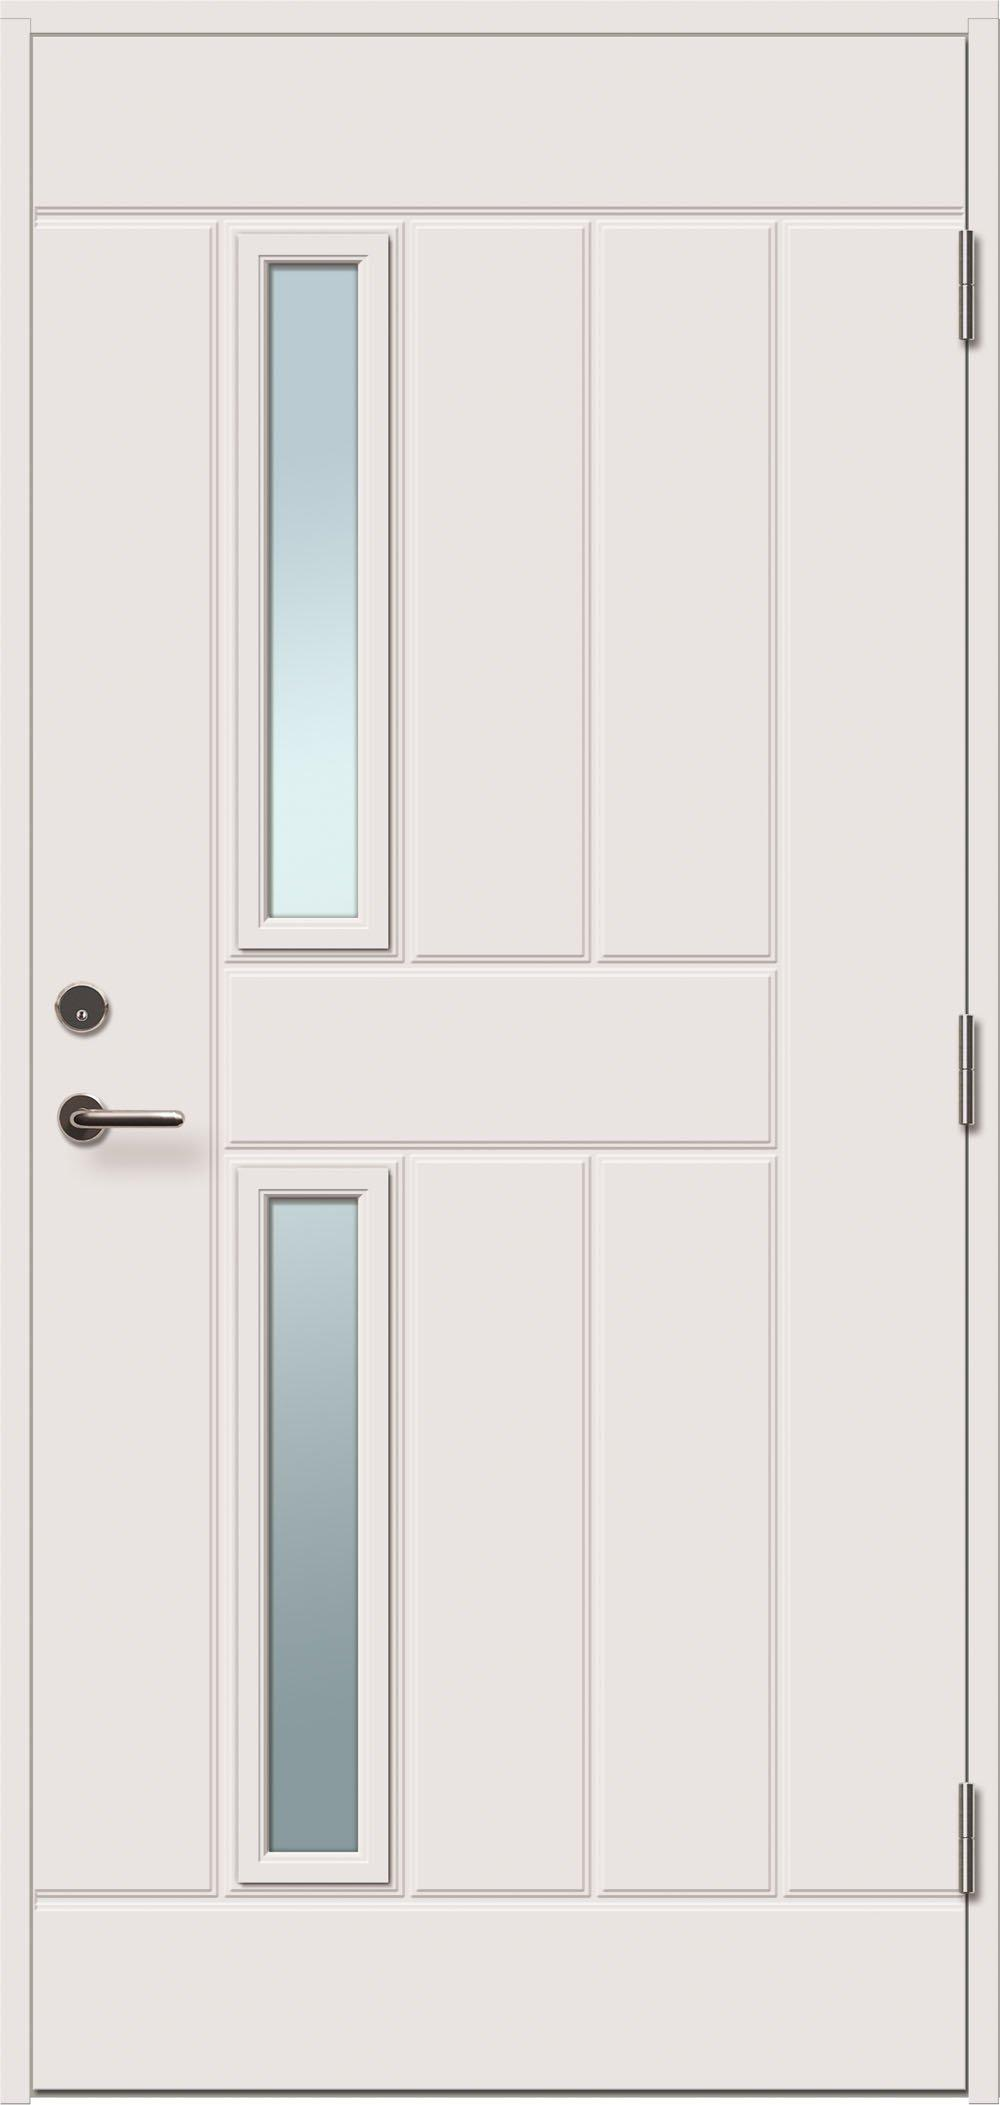 viljandi aken ja uks välisuks lydia 2x1R